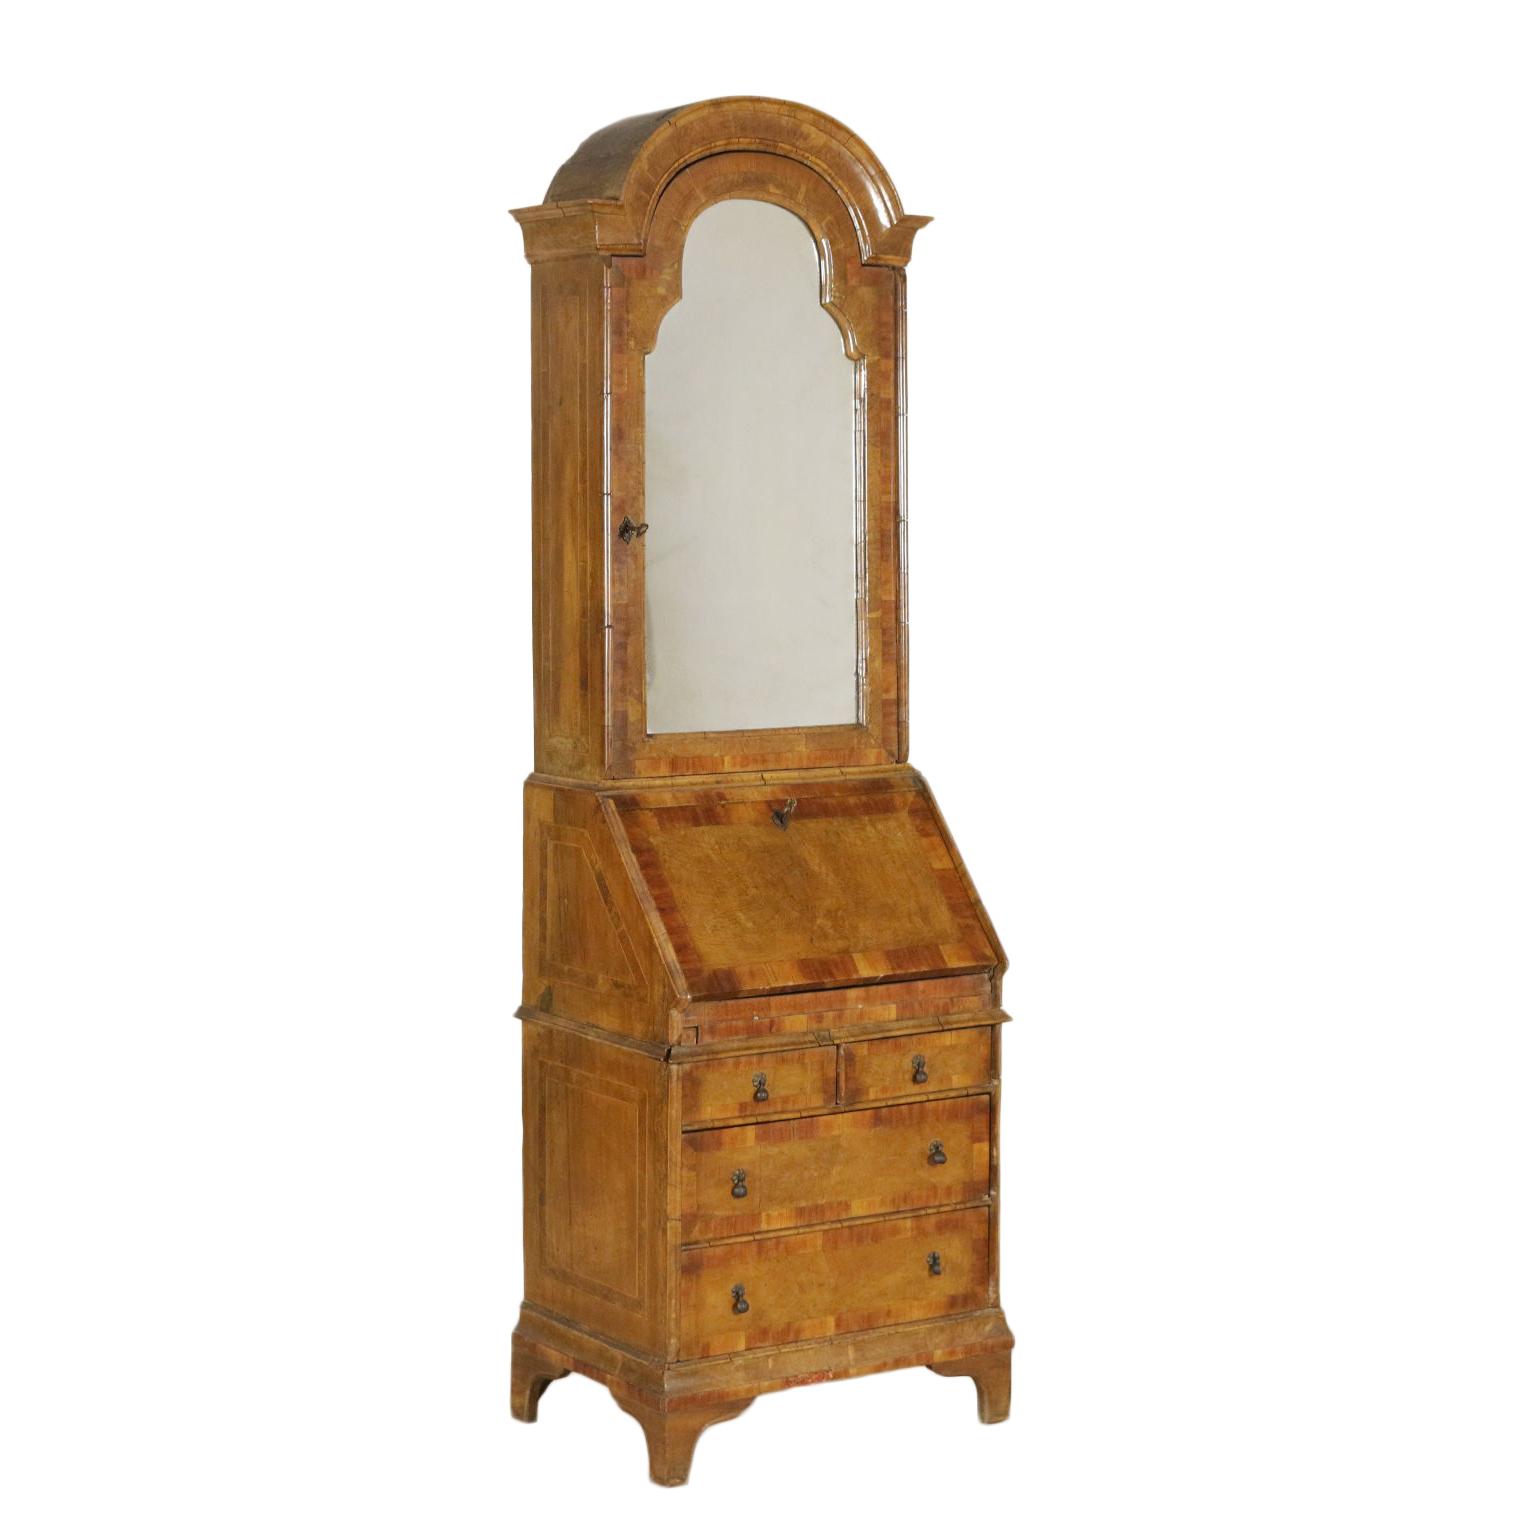 Trumeau Estilo - Muebles de estilo - Bottega del 900 - dimanoinmano.it